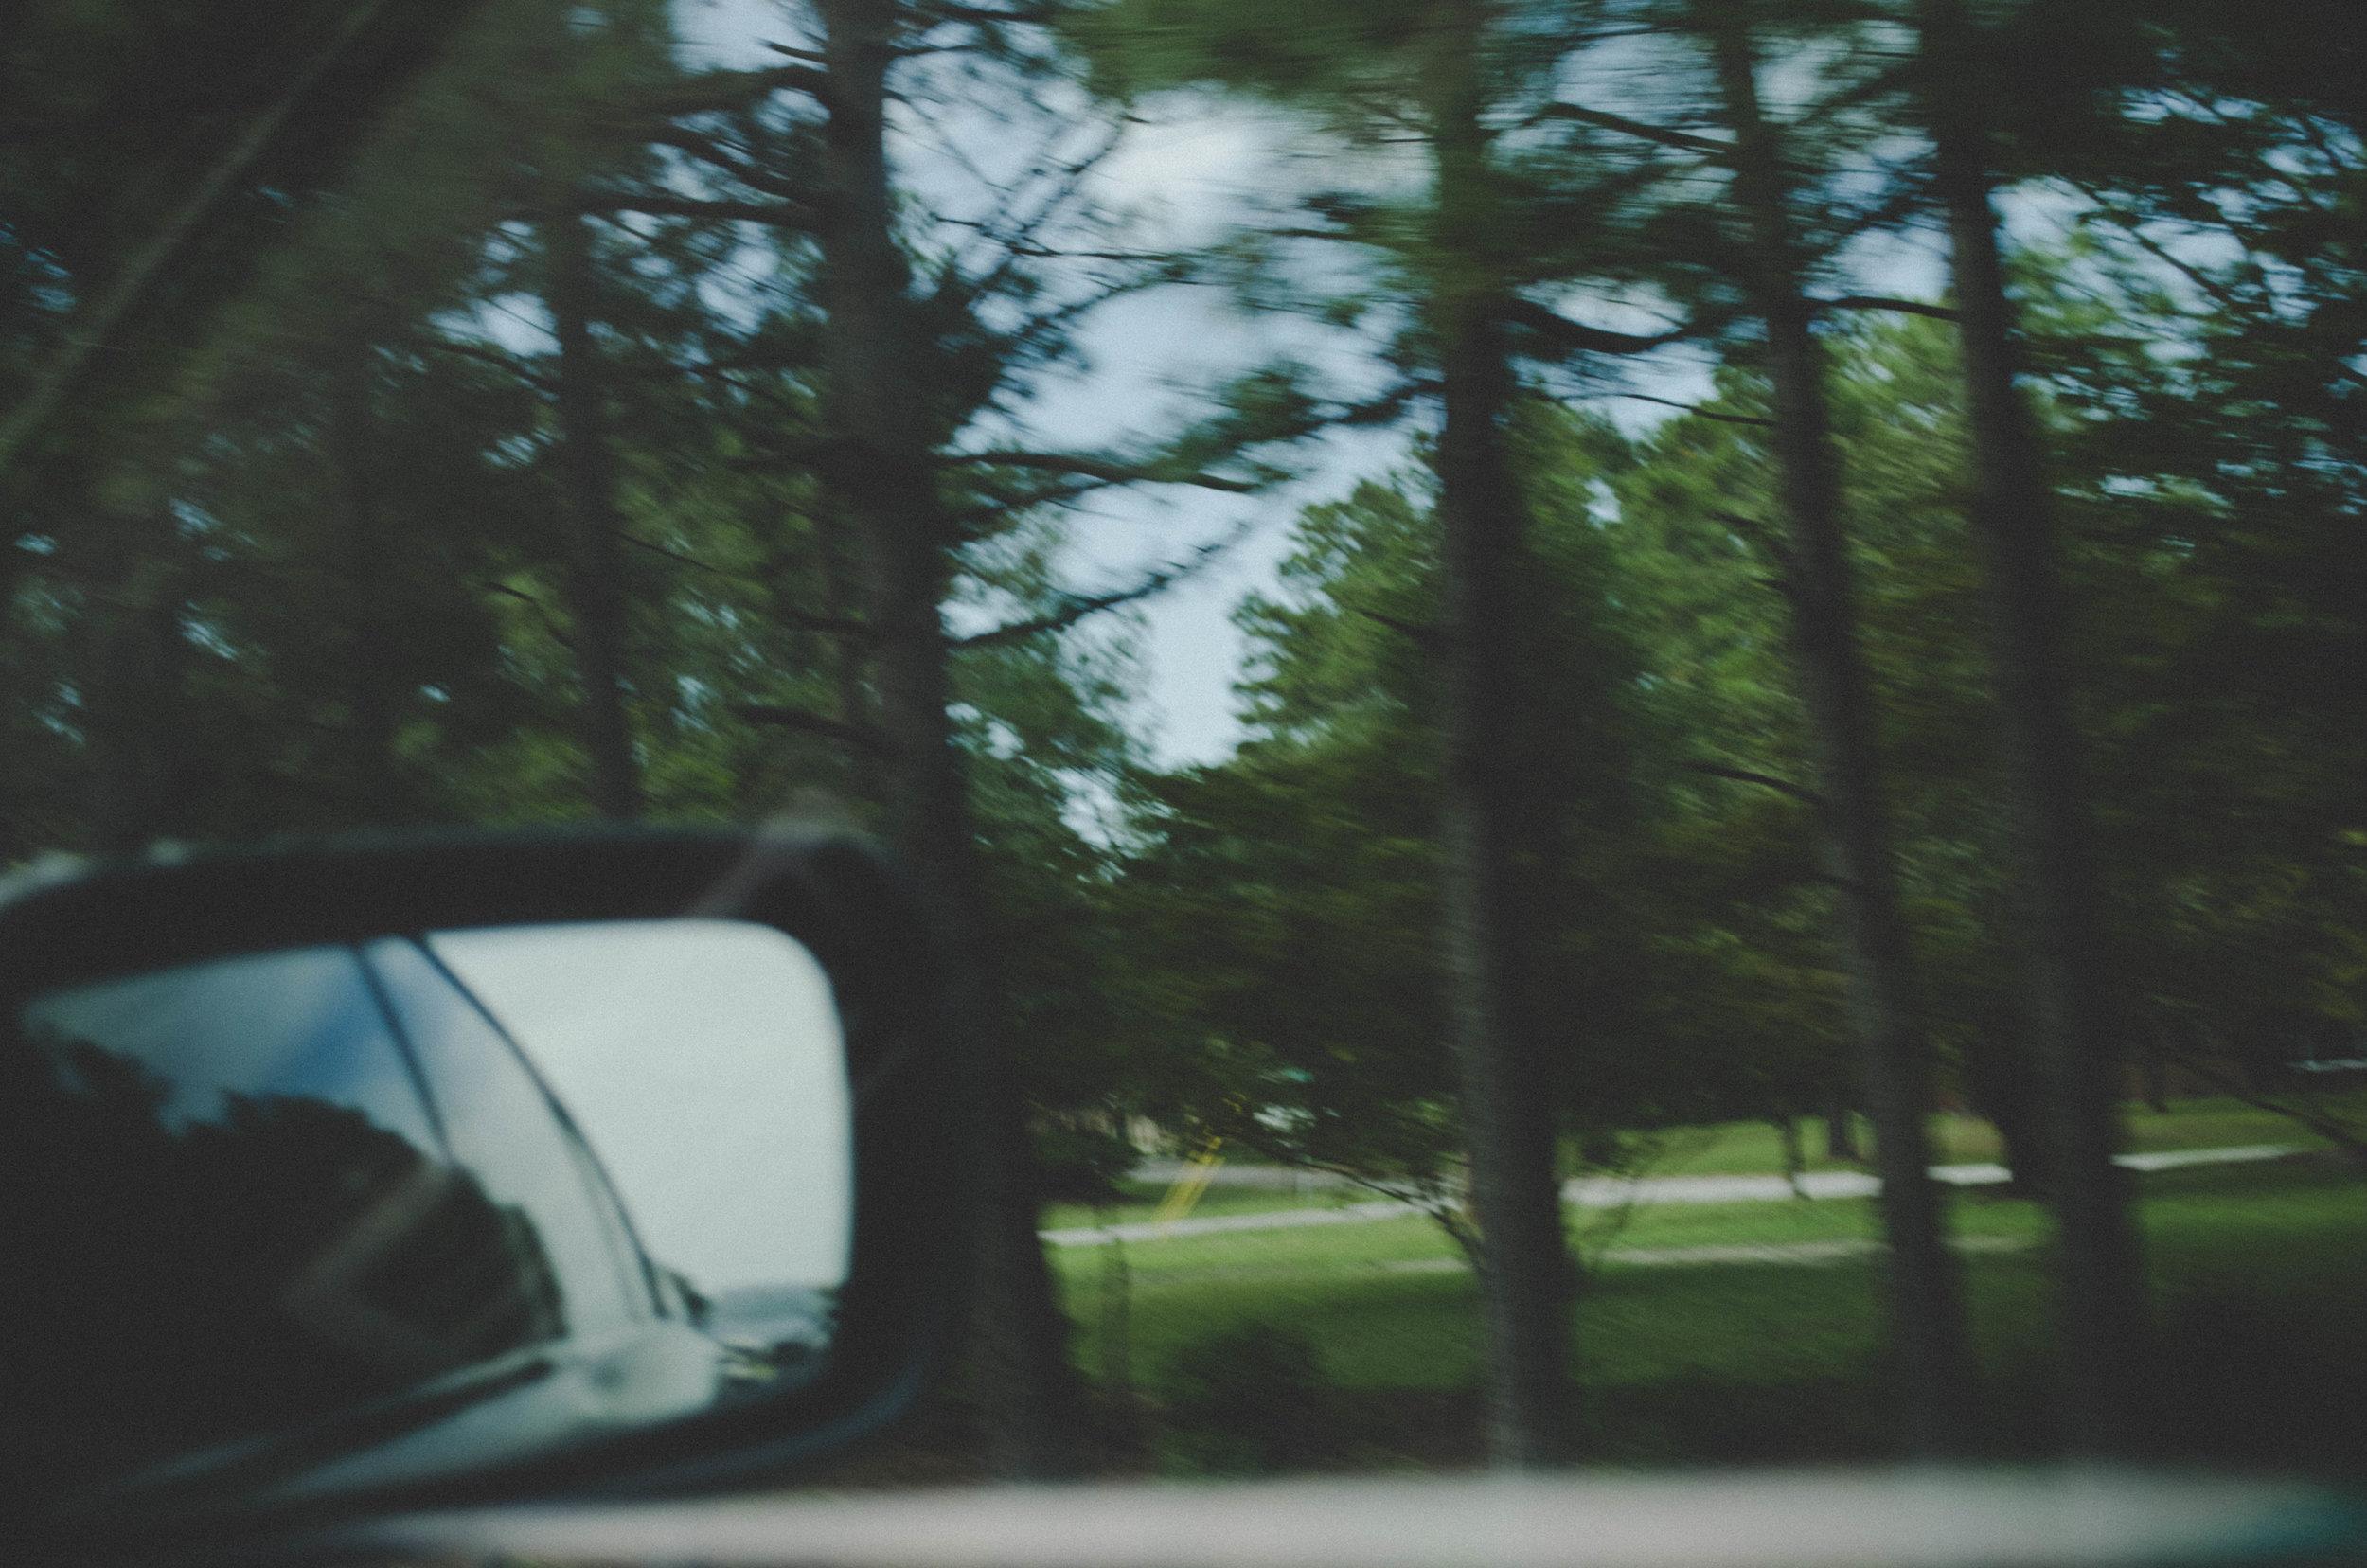 Fayetteville - North Carolina